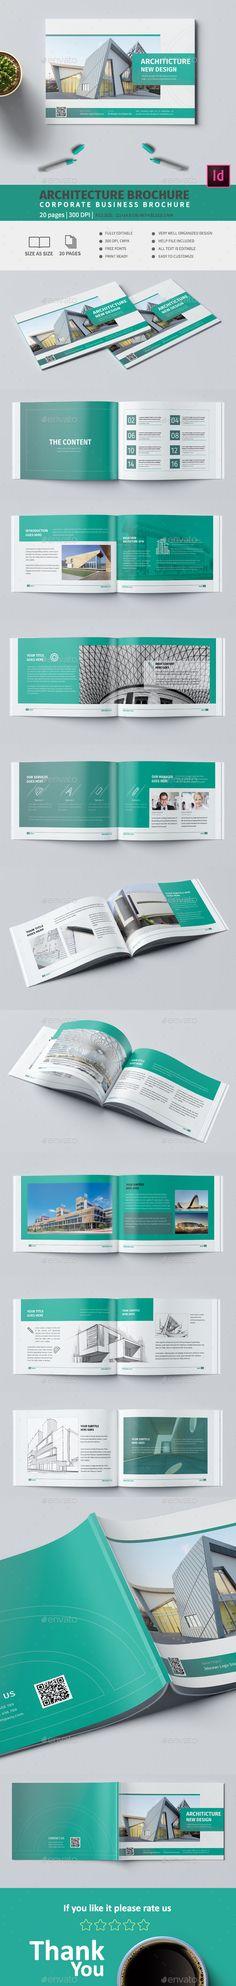 #Architecture A5 #Brochure - Corporate Brochures Teacher Brochure, Corporate Brochure, Business Brochure, Travel Brochure Template, Brochure Design, Brochure Ideas, Event Poster Design, Catalog Design, Flyer Design Templates